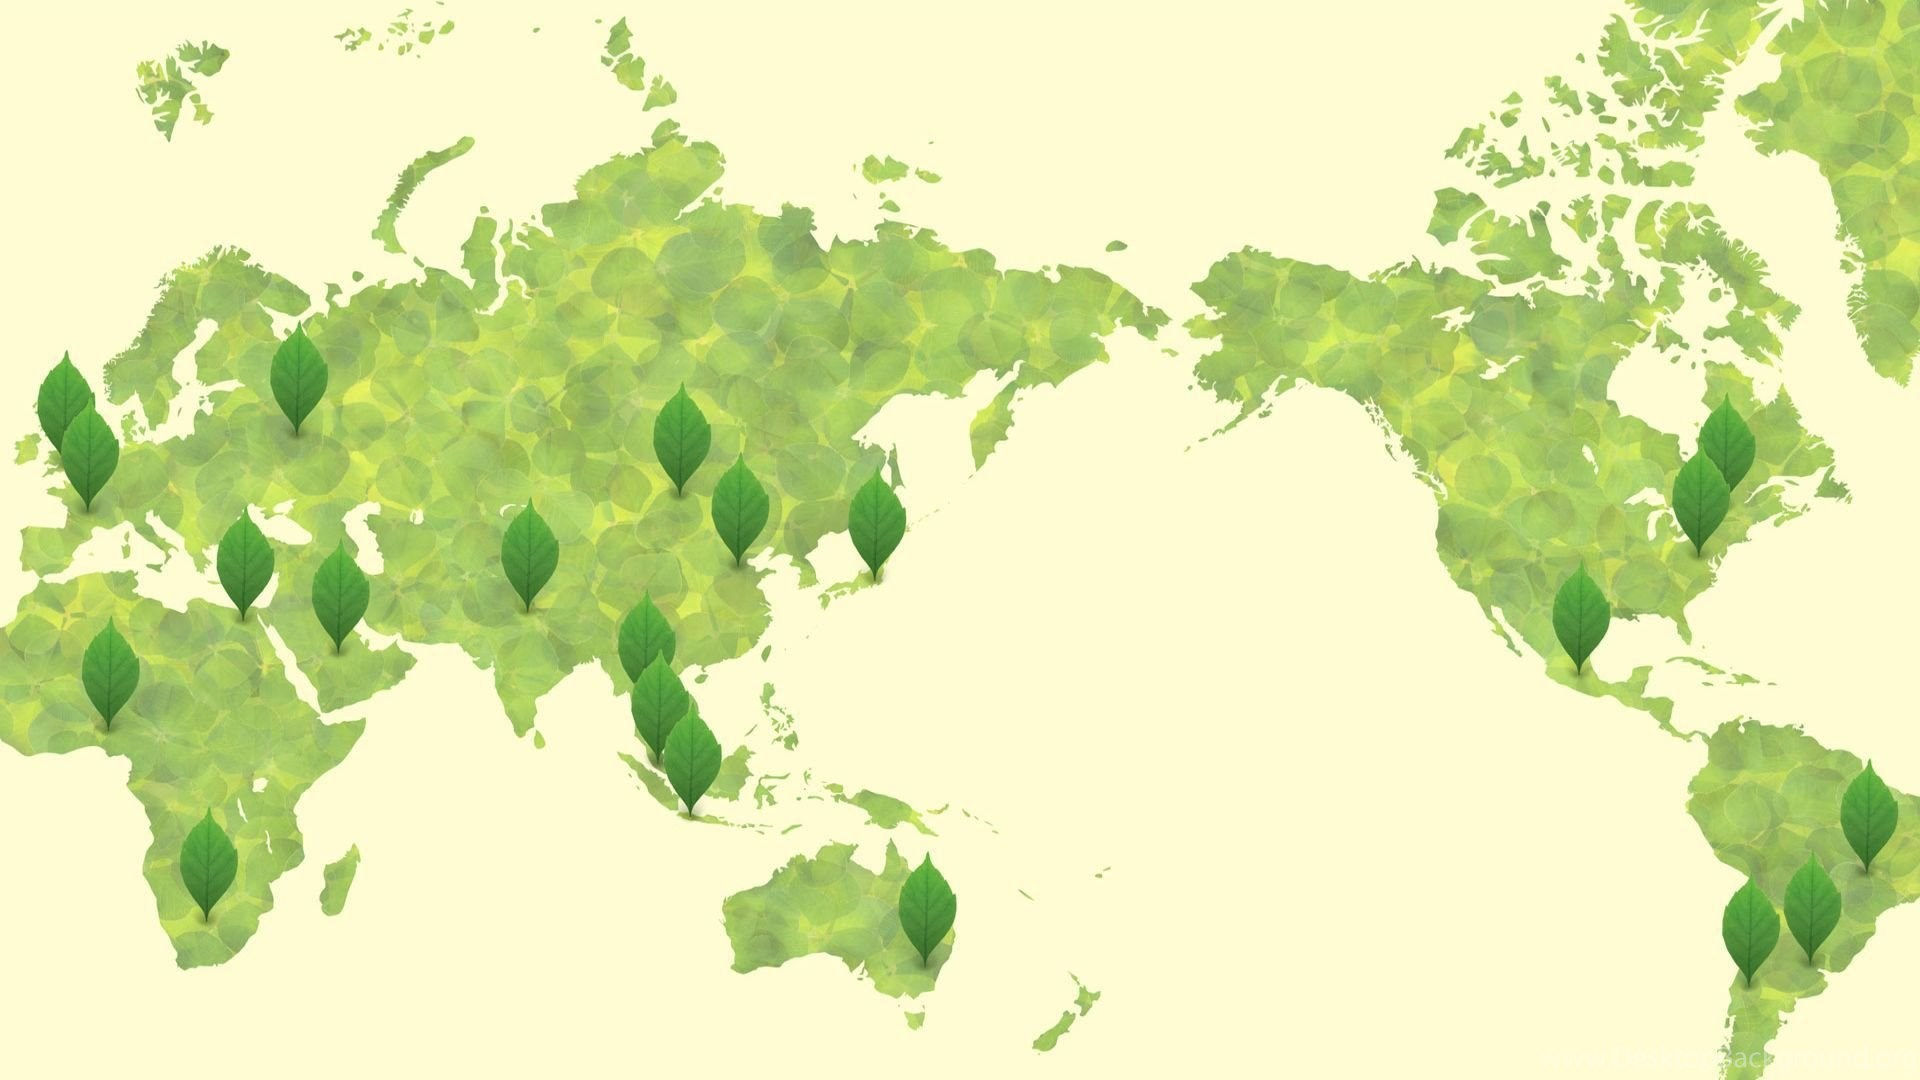 Green World Map Wallpapers Free Wide Hd Wallpapers Desktop Background